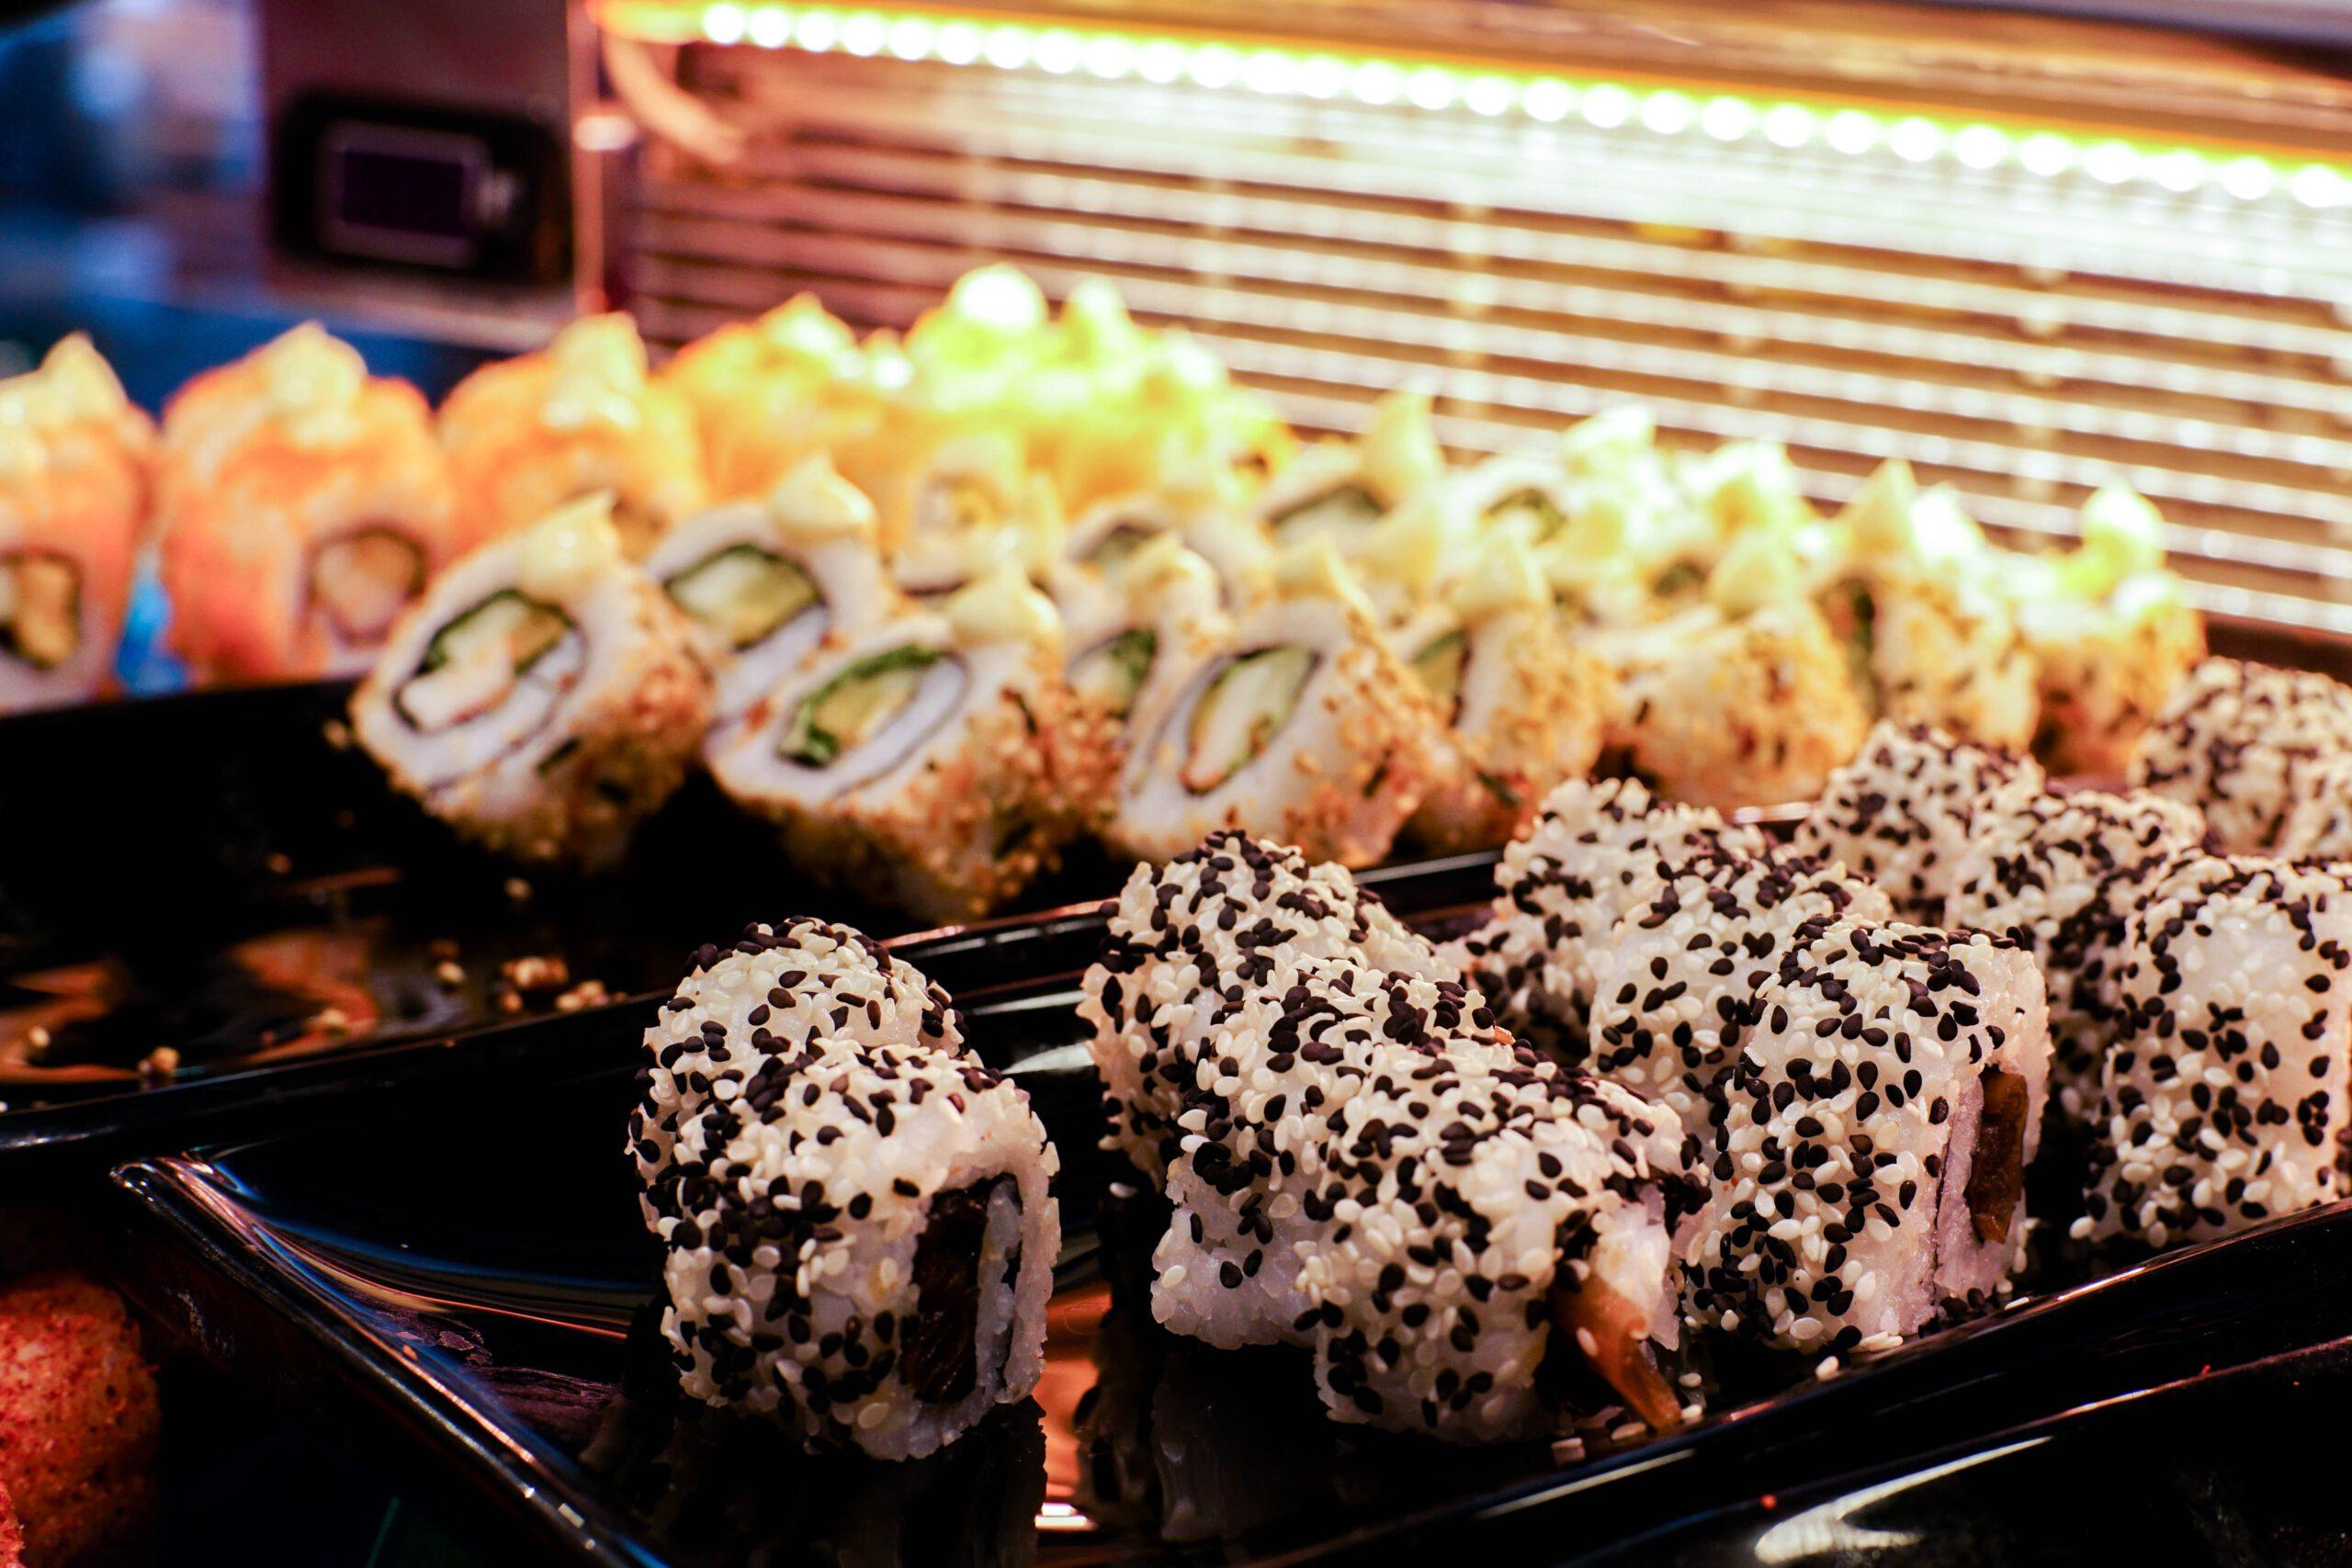 Asia-sushi-bar im Kaufland Königs Wusterhausen